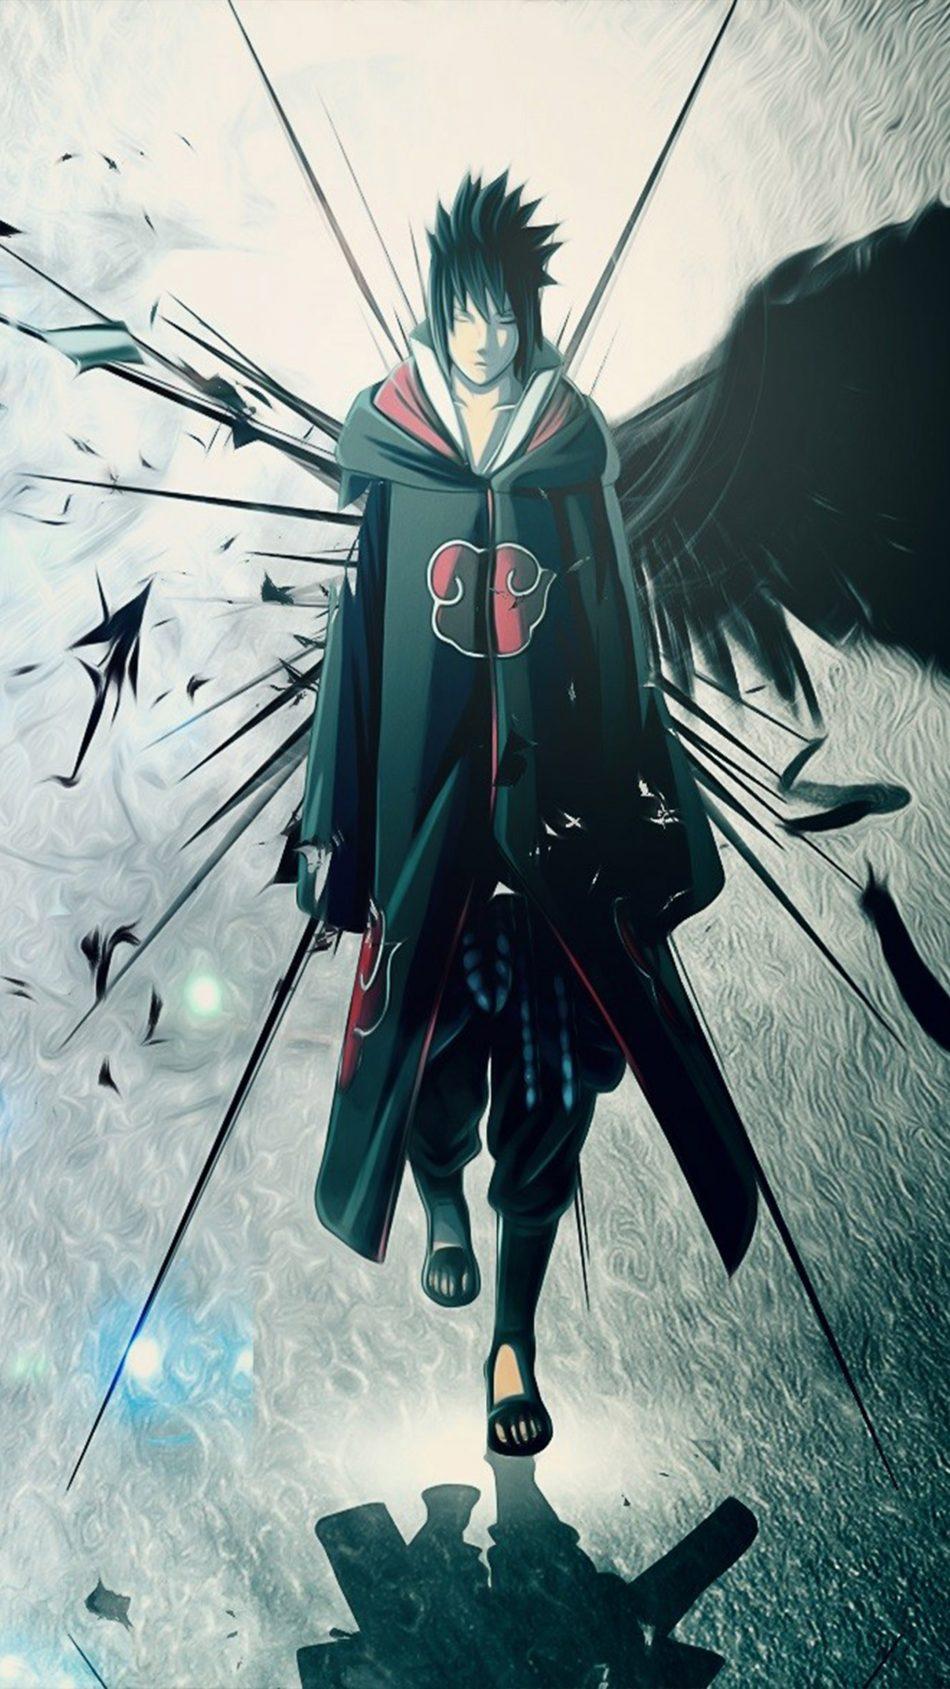 Download Best Quality Naruto Sasuke Uchiha 4K UHD Mobile